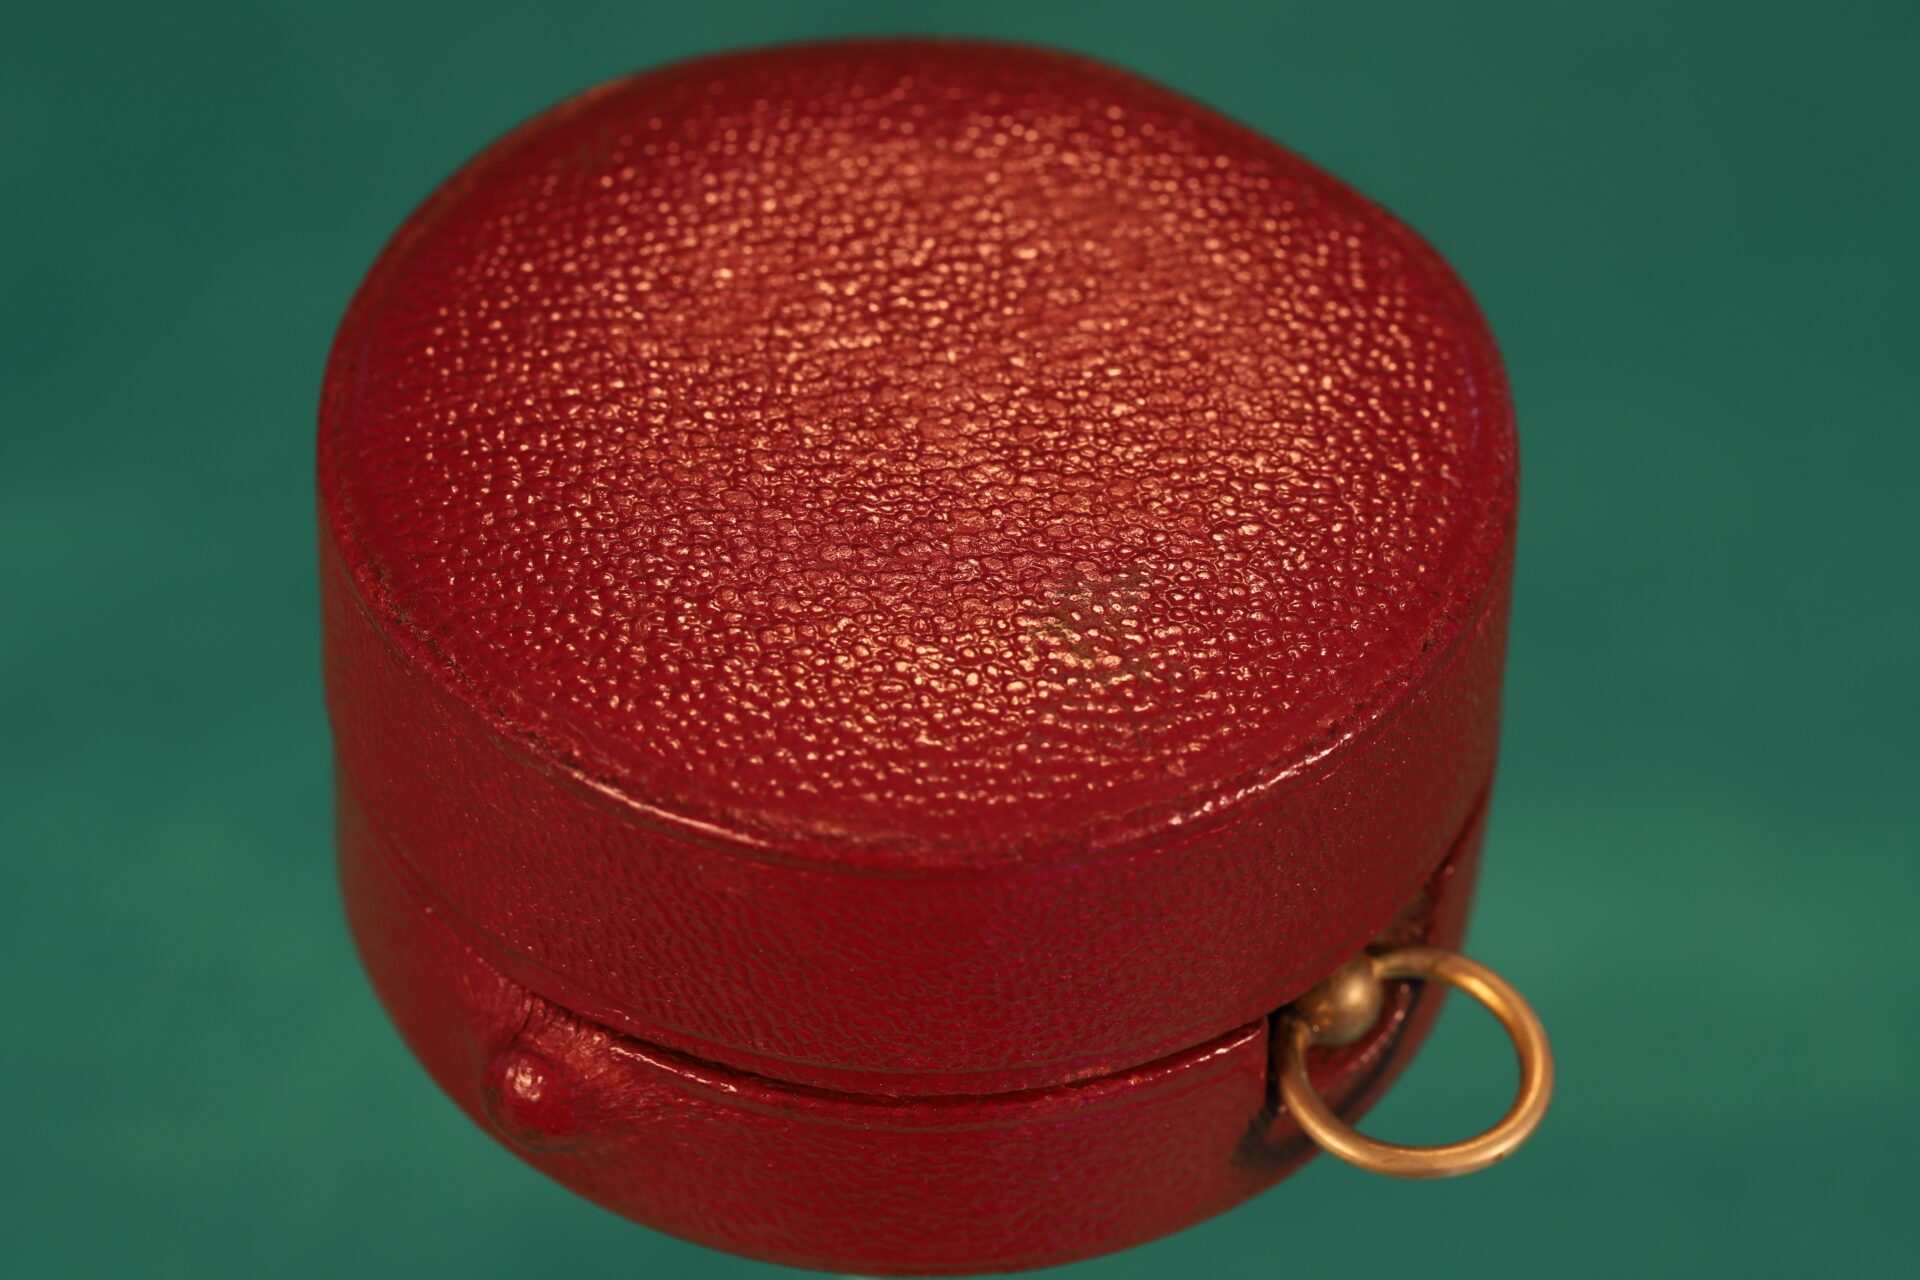 Image of closed case for Newton Pocket Barometer Compendium No 1082